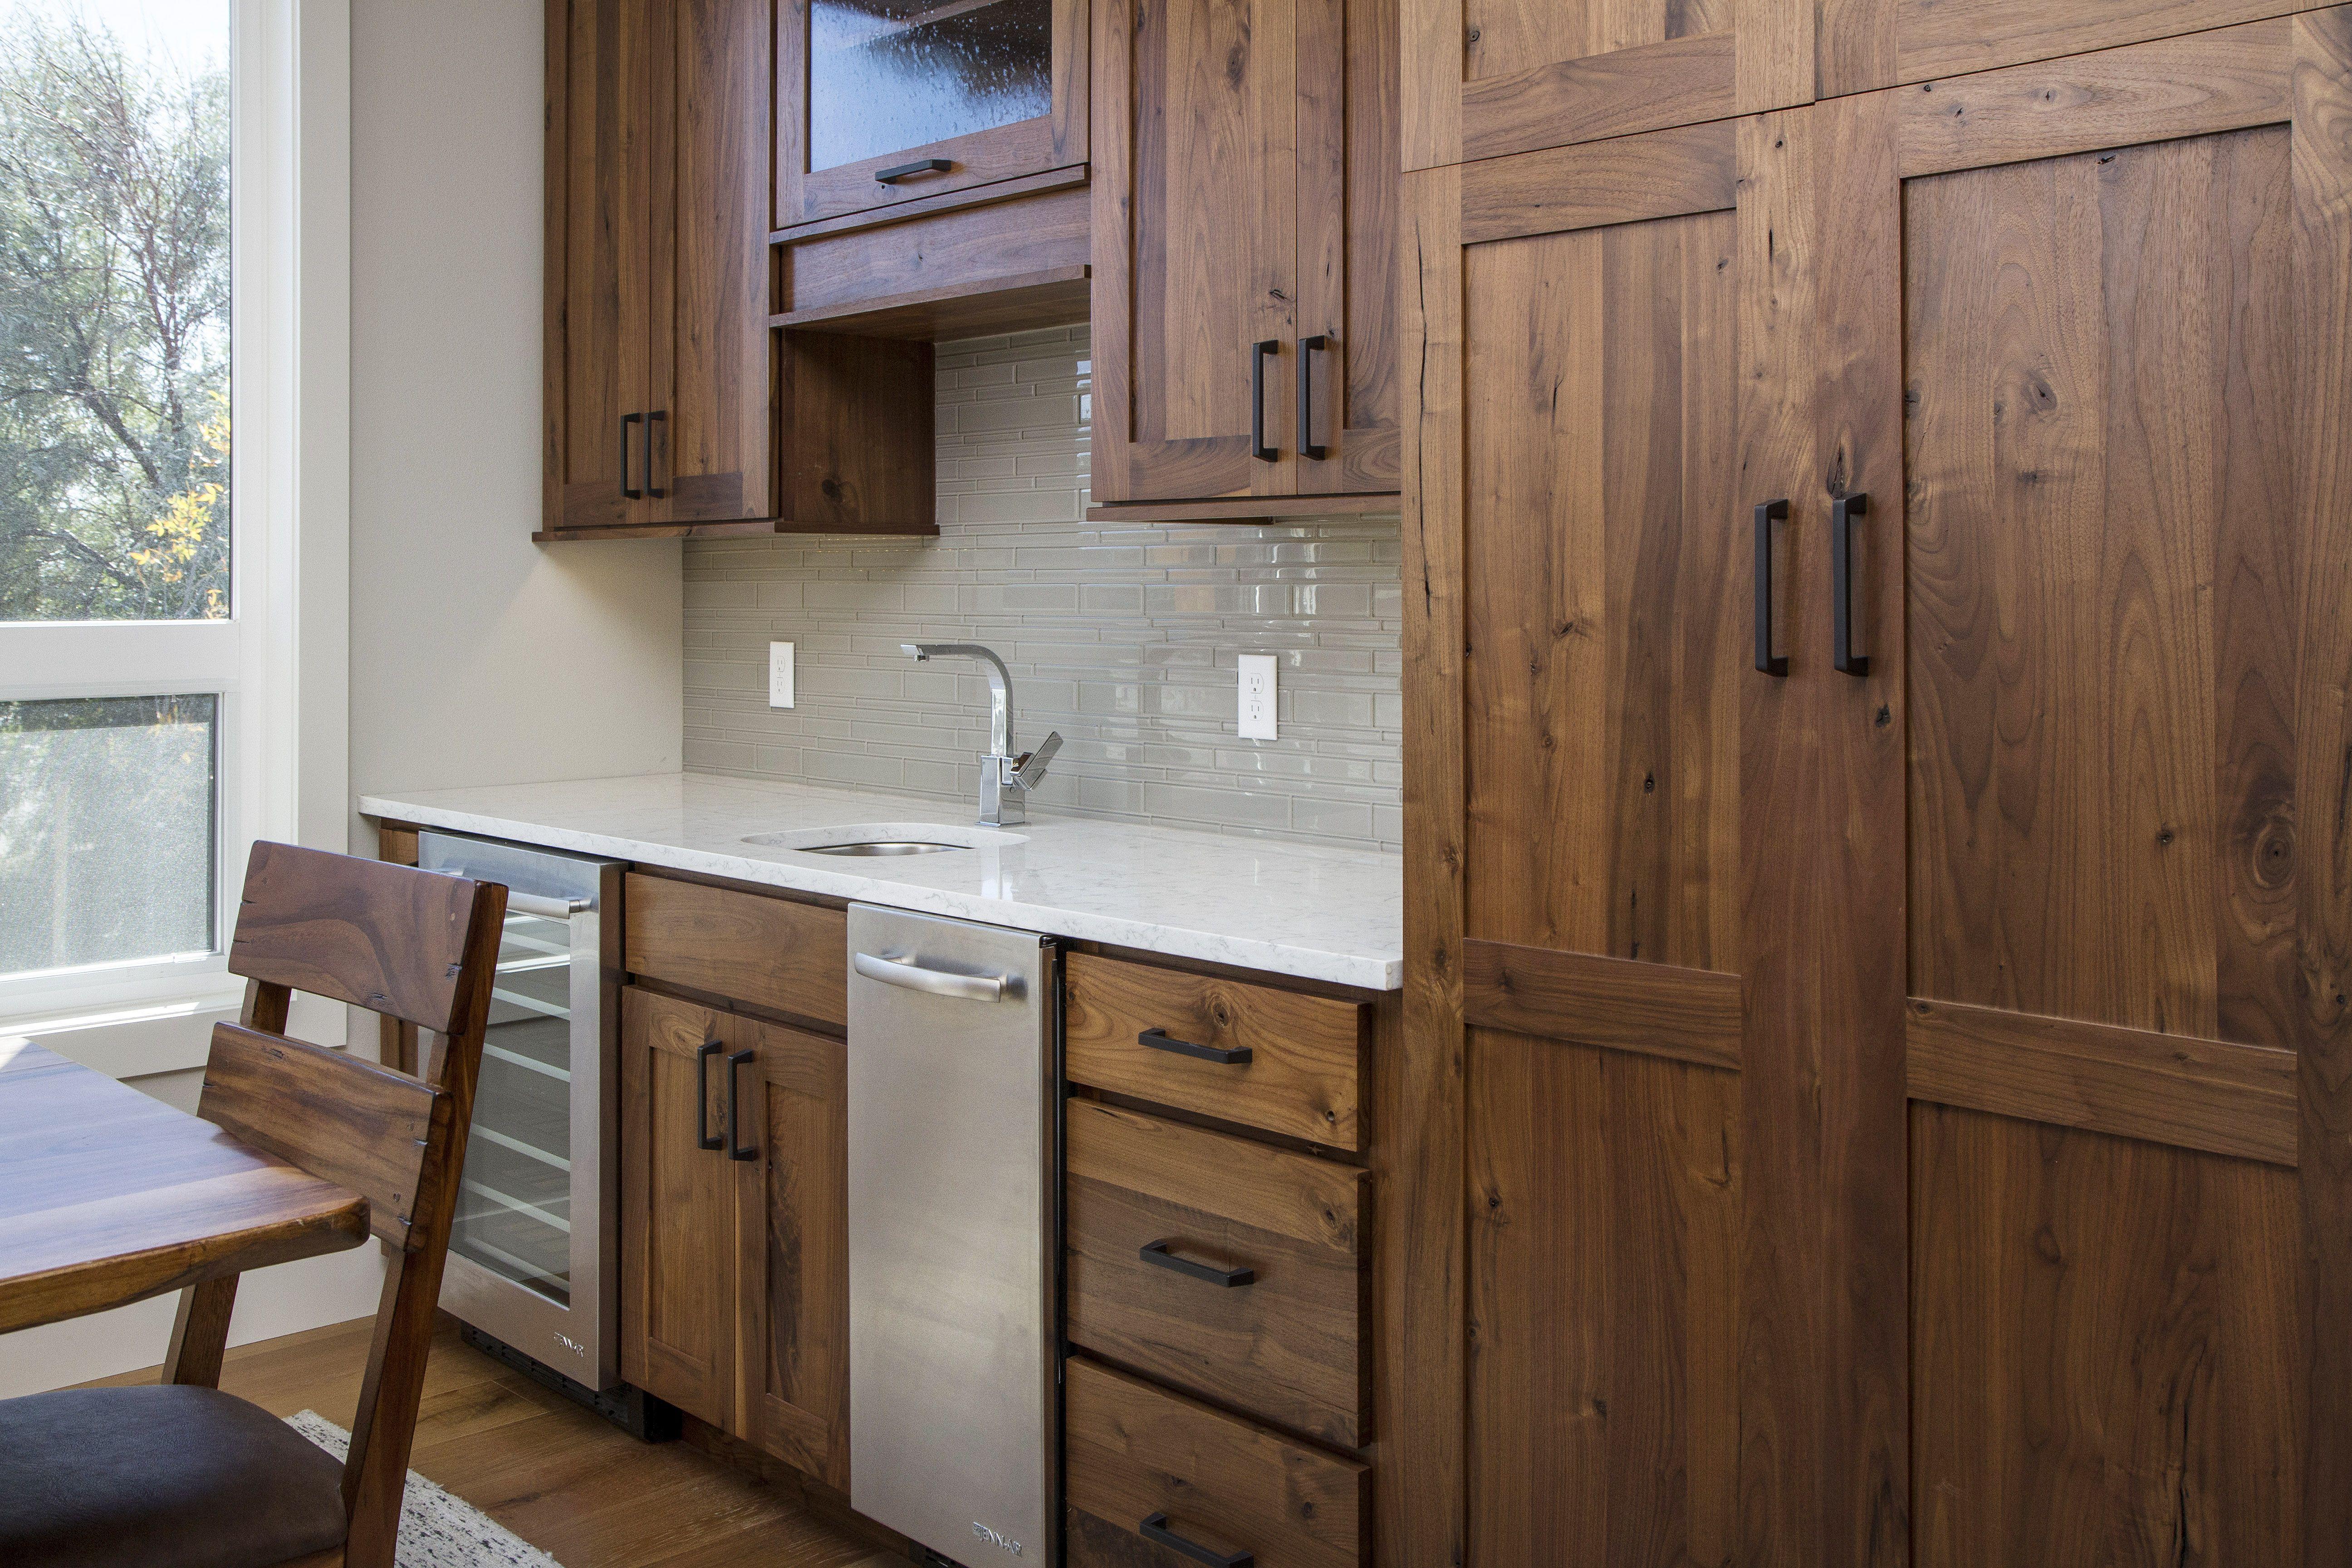 Bigcreek Knotty Walnut Natural Timeless Kitchen Walnut Kitchen Traditional Kitchen